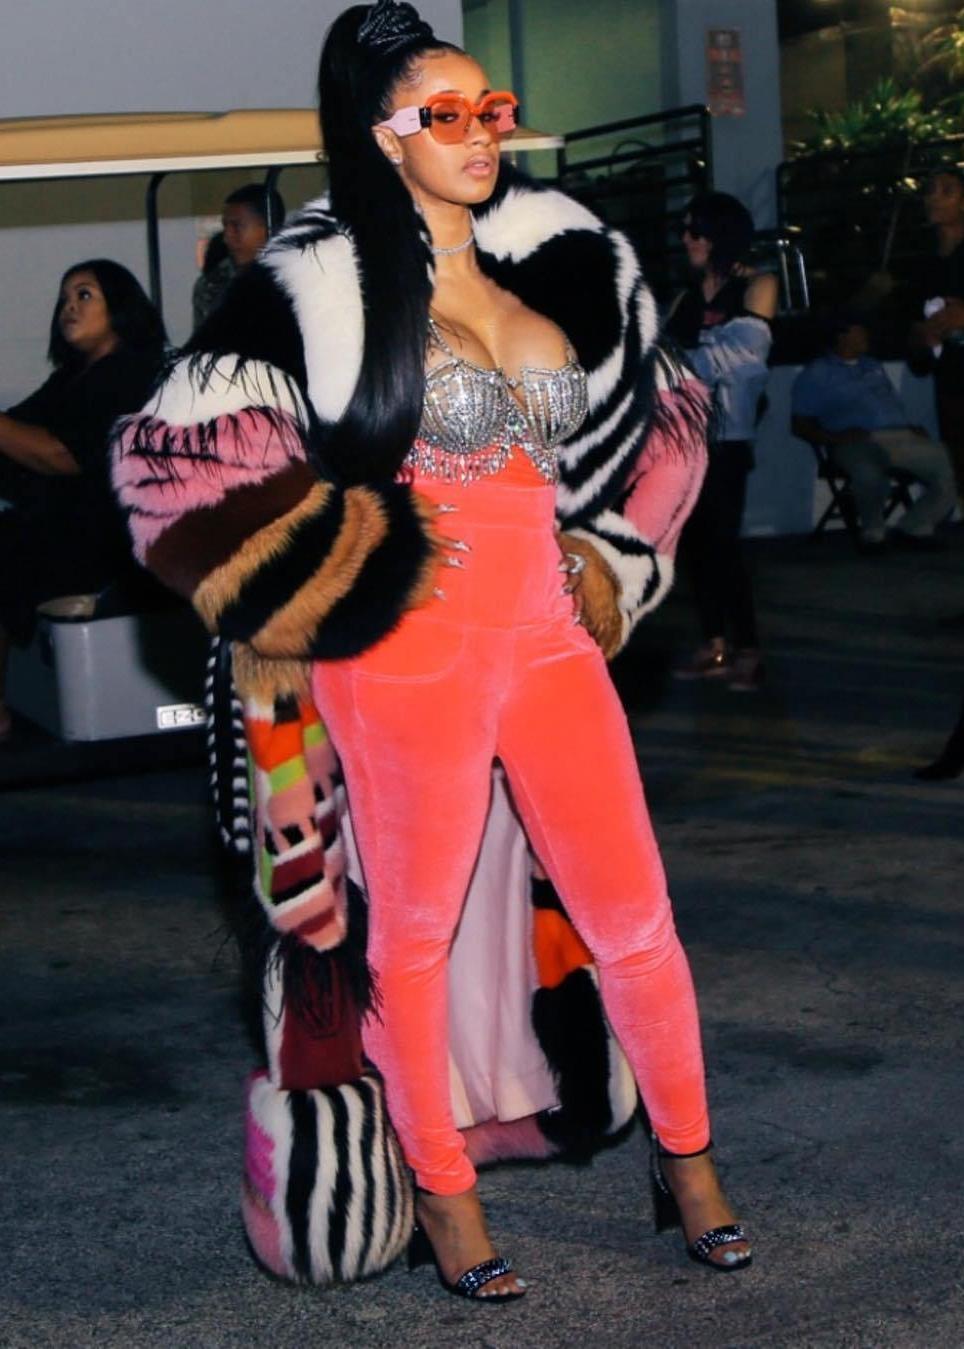 Cardi B performed at the BET Hip Hop Awards wearing a fabulous fur coat, hot pink velour pants and a diamond bra.